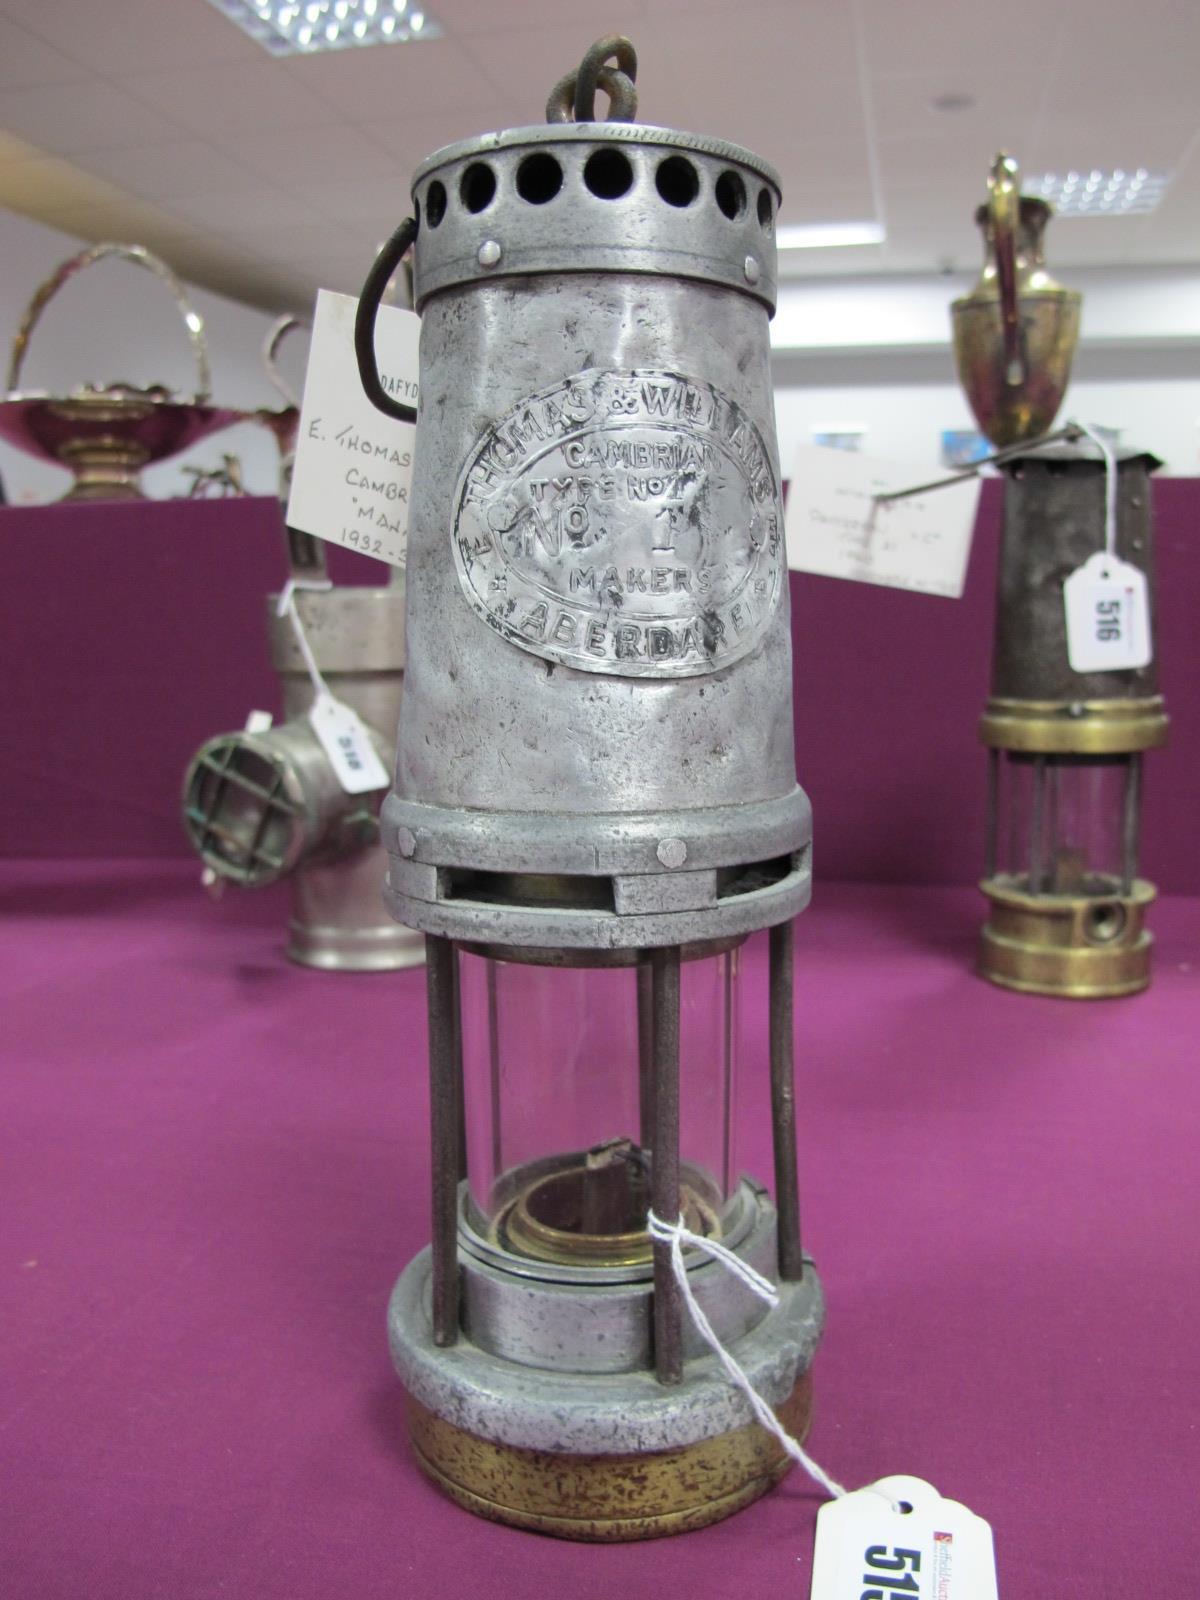 E. Thomas Williams, Aberdare, Type No. 1 Miners Lamp, 1932-39 'Managers' stamped No. 1, aluminium